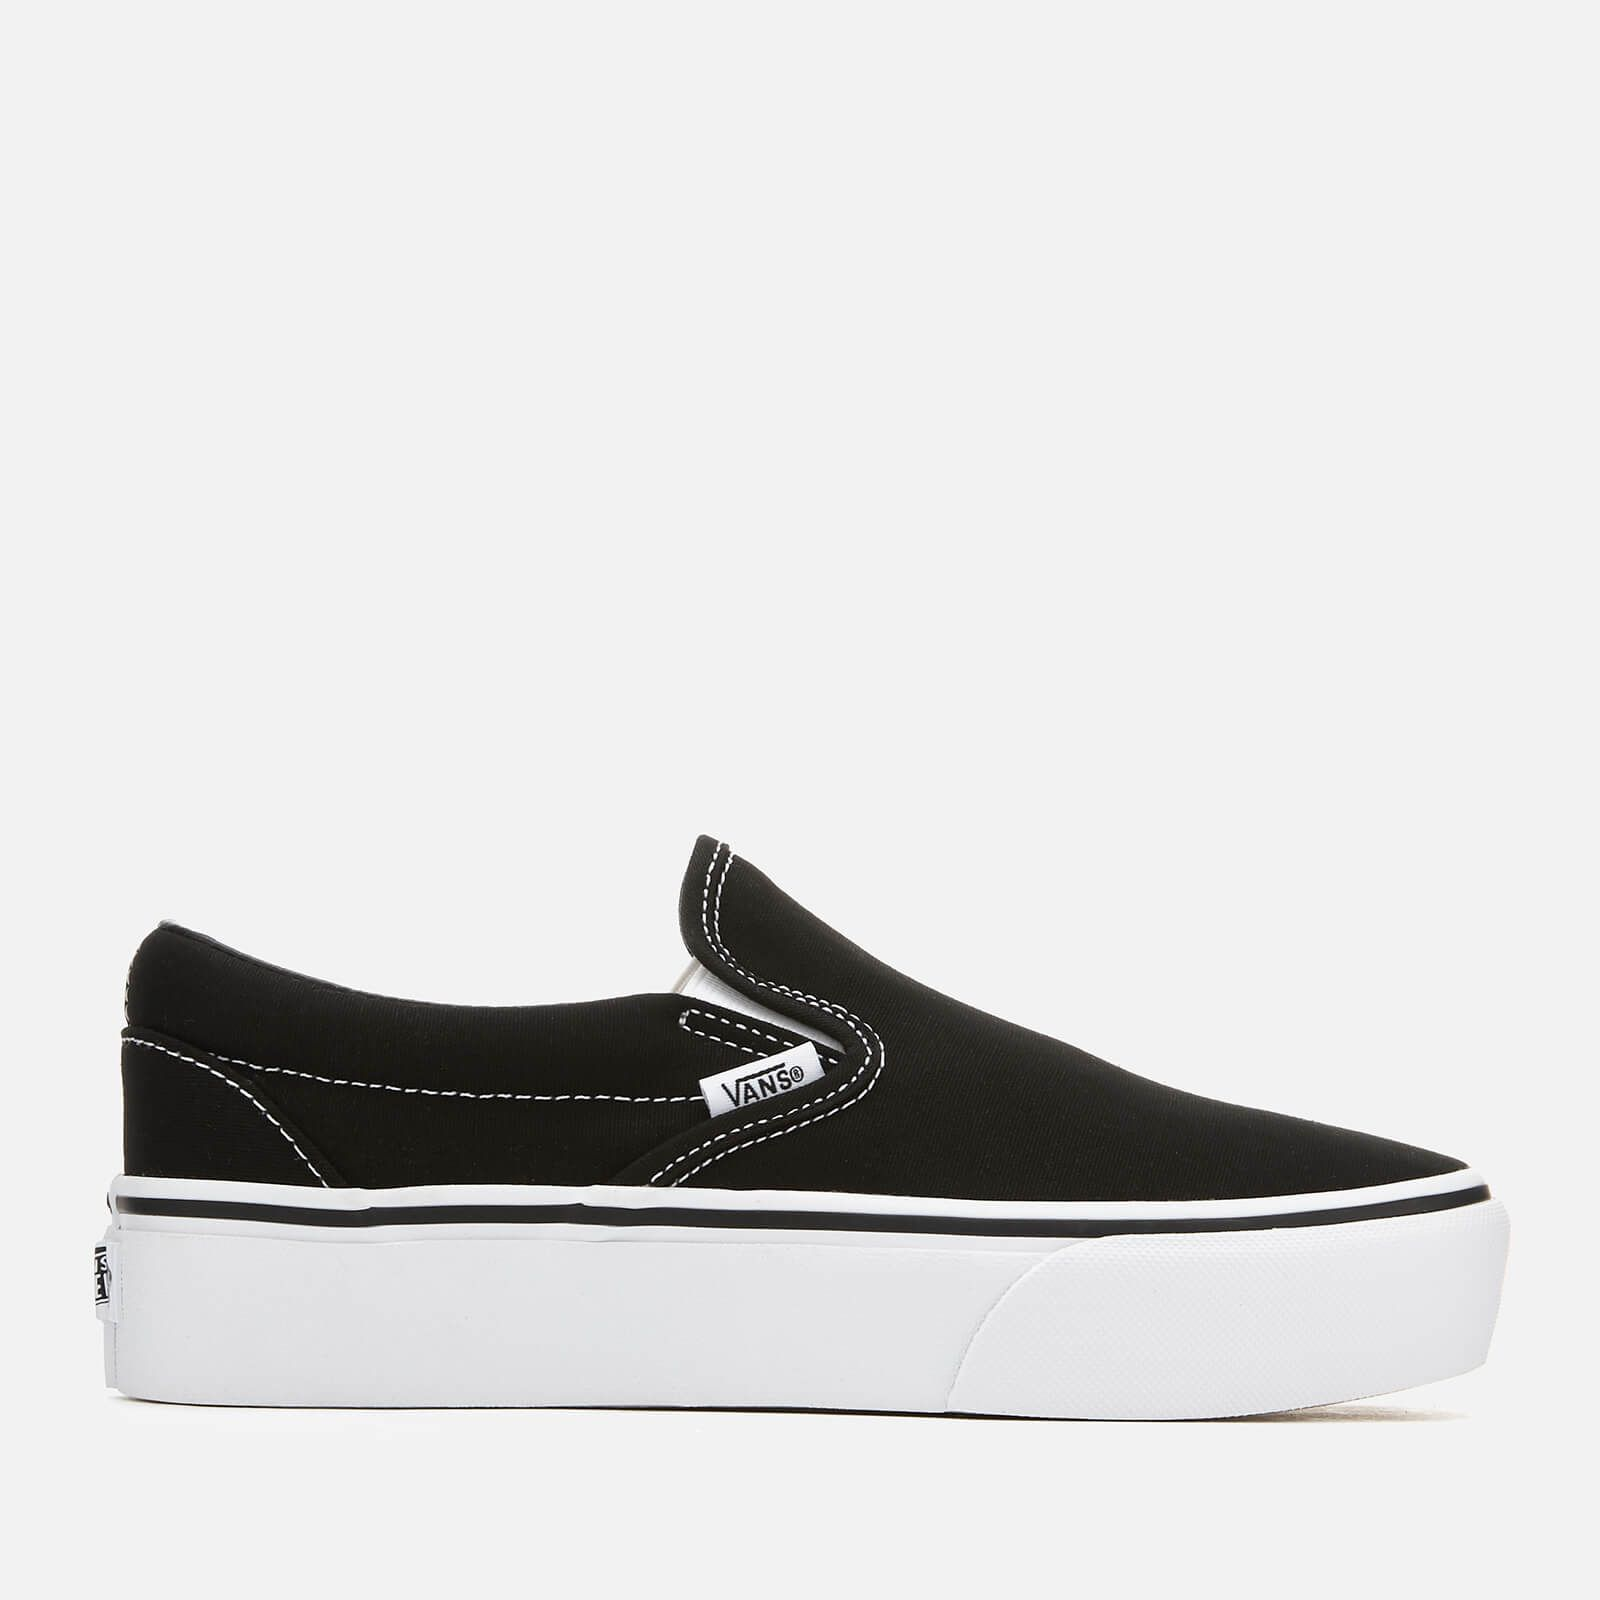 Vans Women's Classic Platform Slip-On